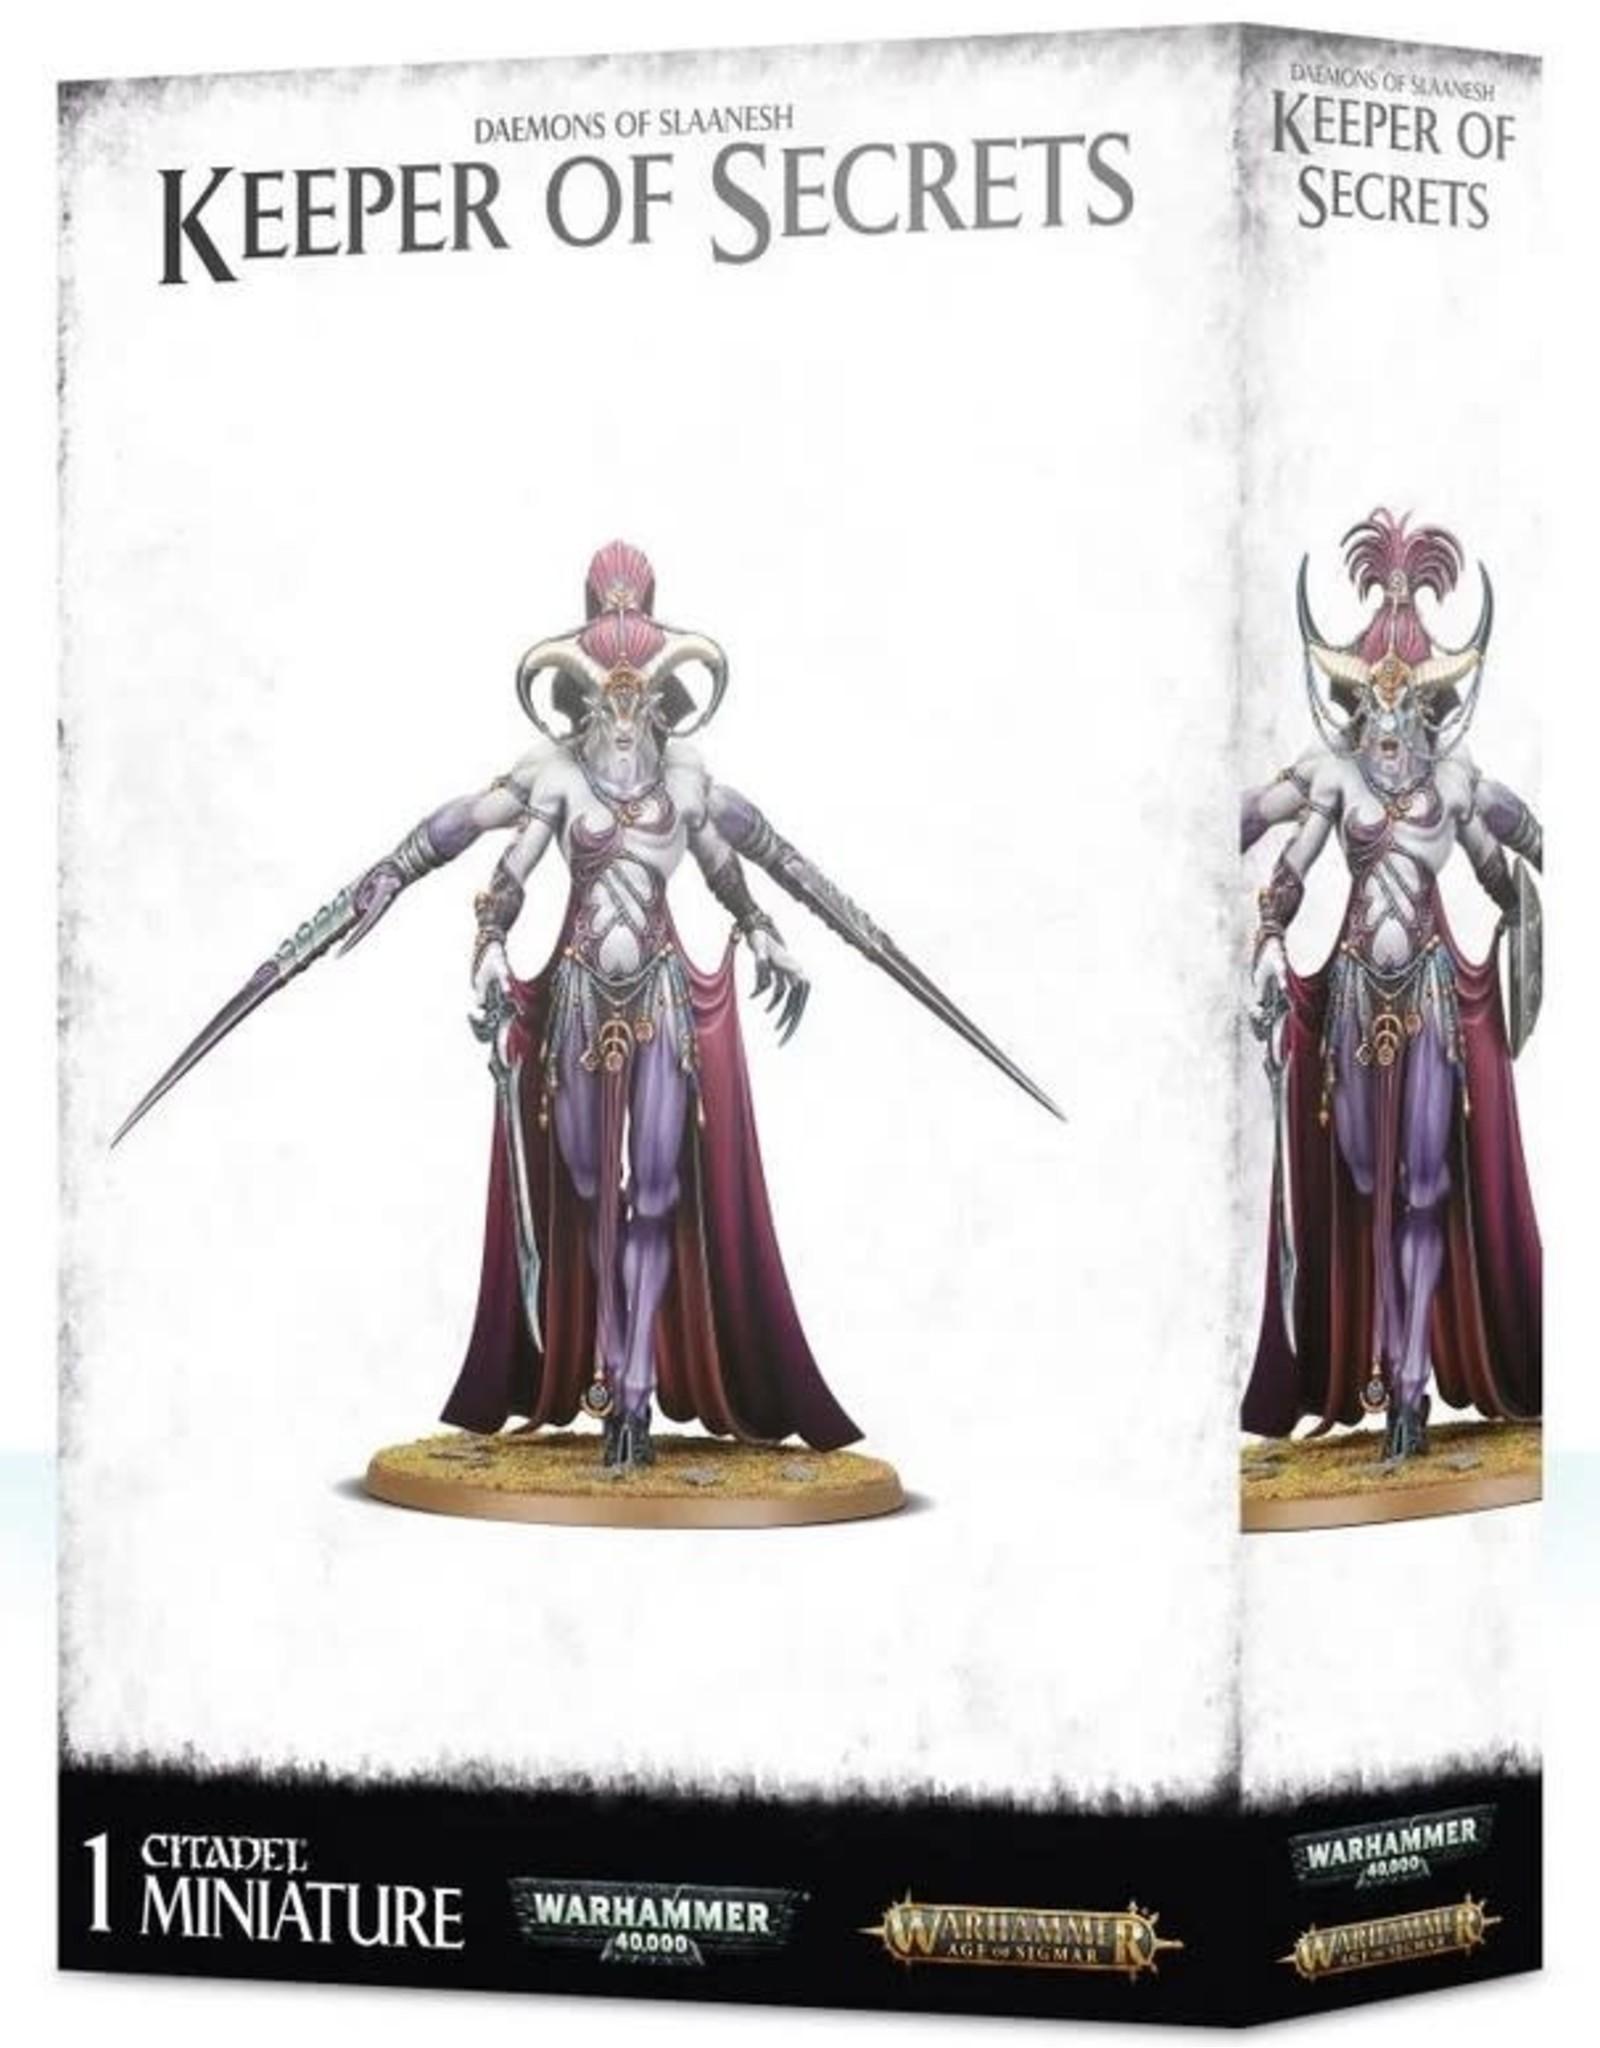 Warhammer AoS WHAoS Hedonites of Slaanesh Keeper of Secrets